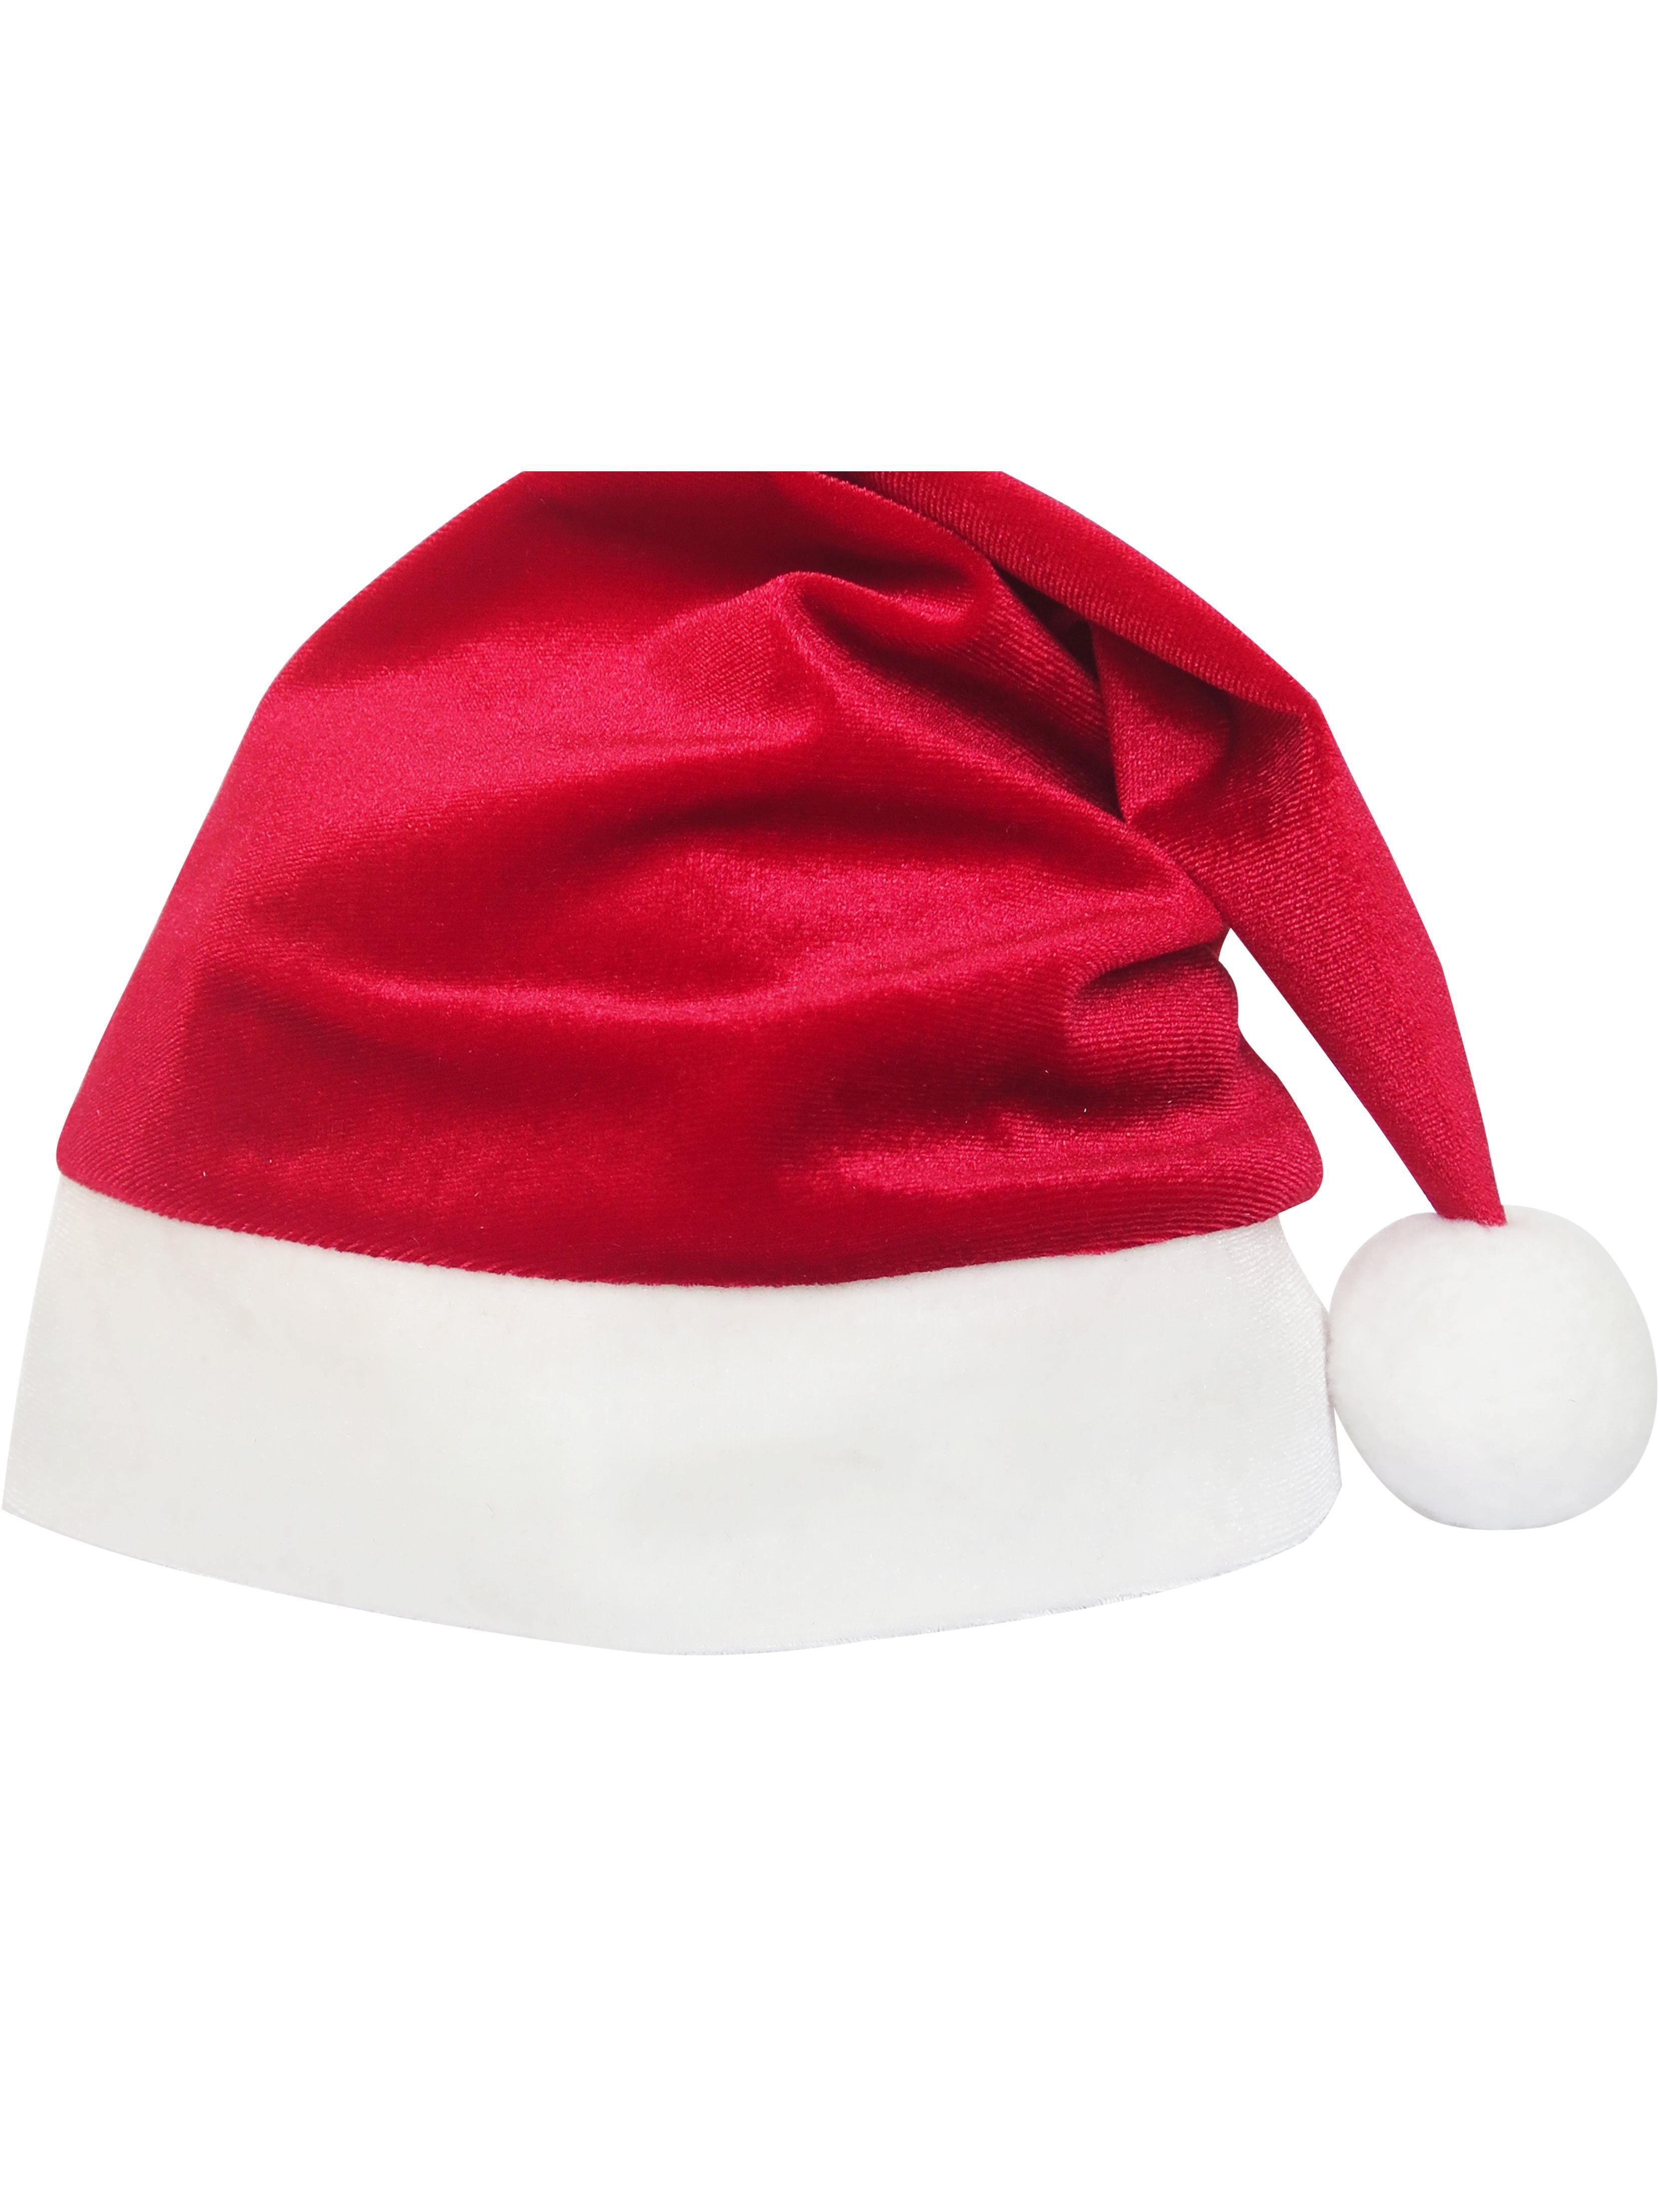 e17c539688518 Sunny Fashion - Girls Dress Christmas Hat Red Velvet Long Sleeve Holiday 10  - Walmart.com